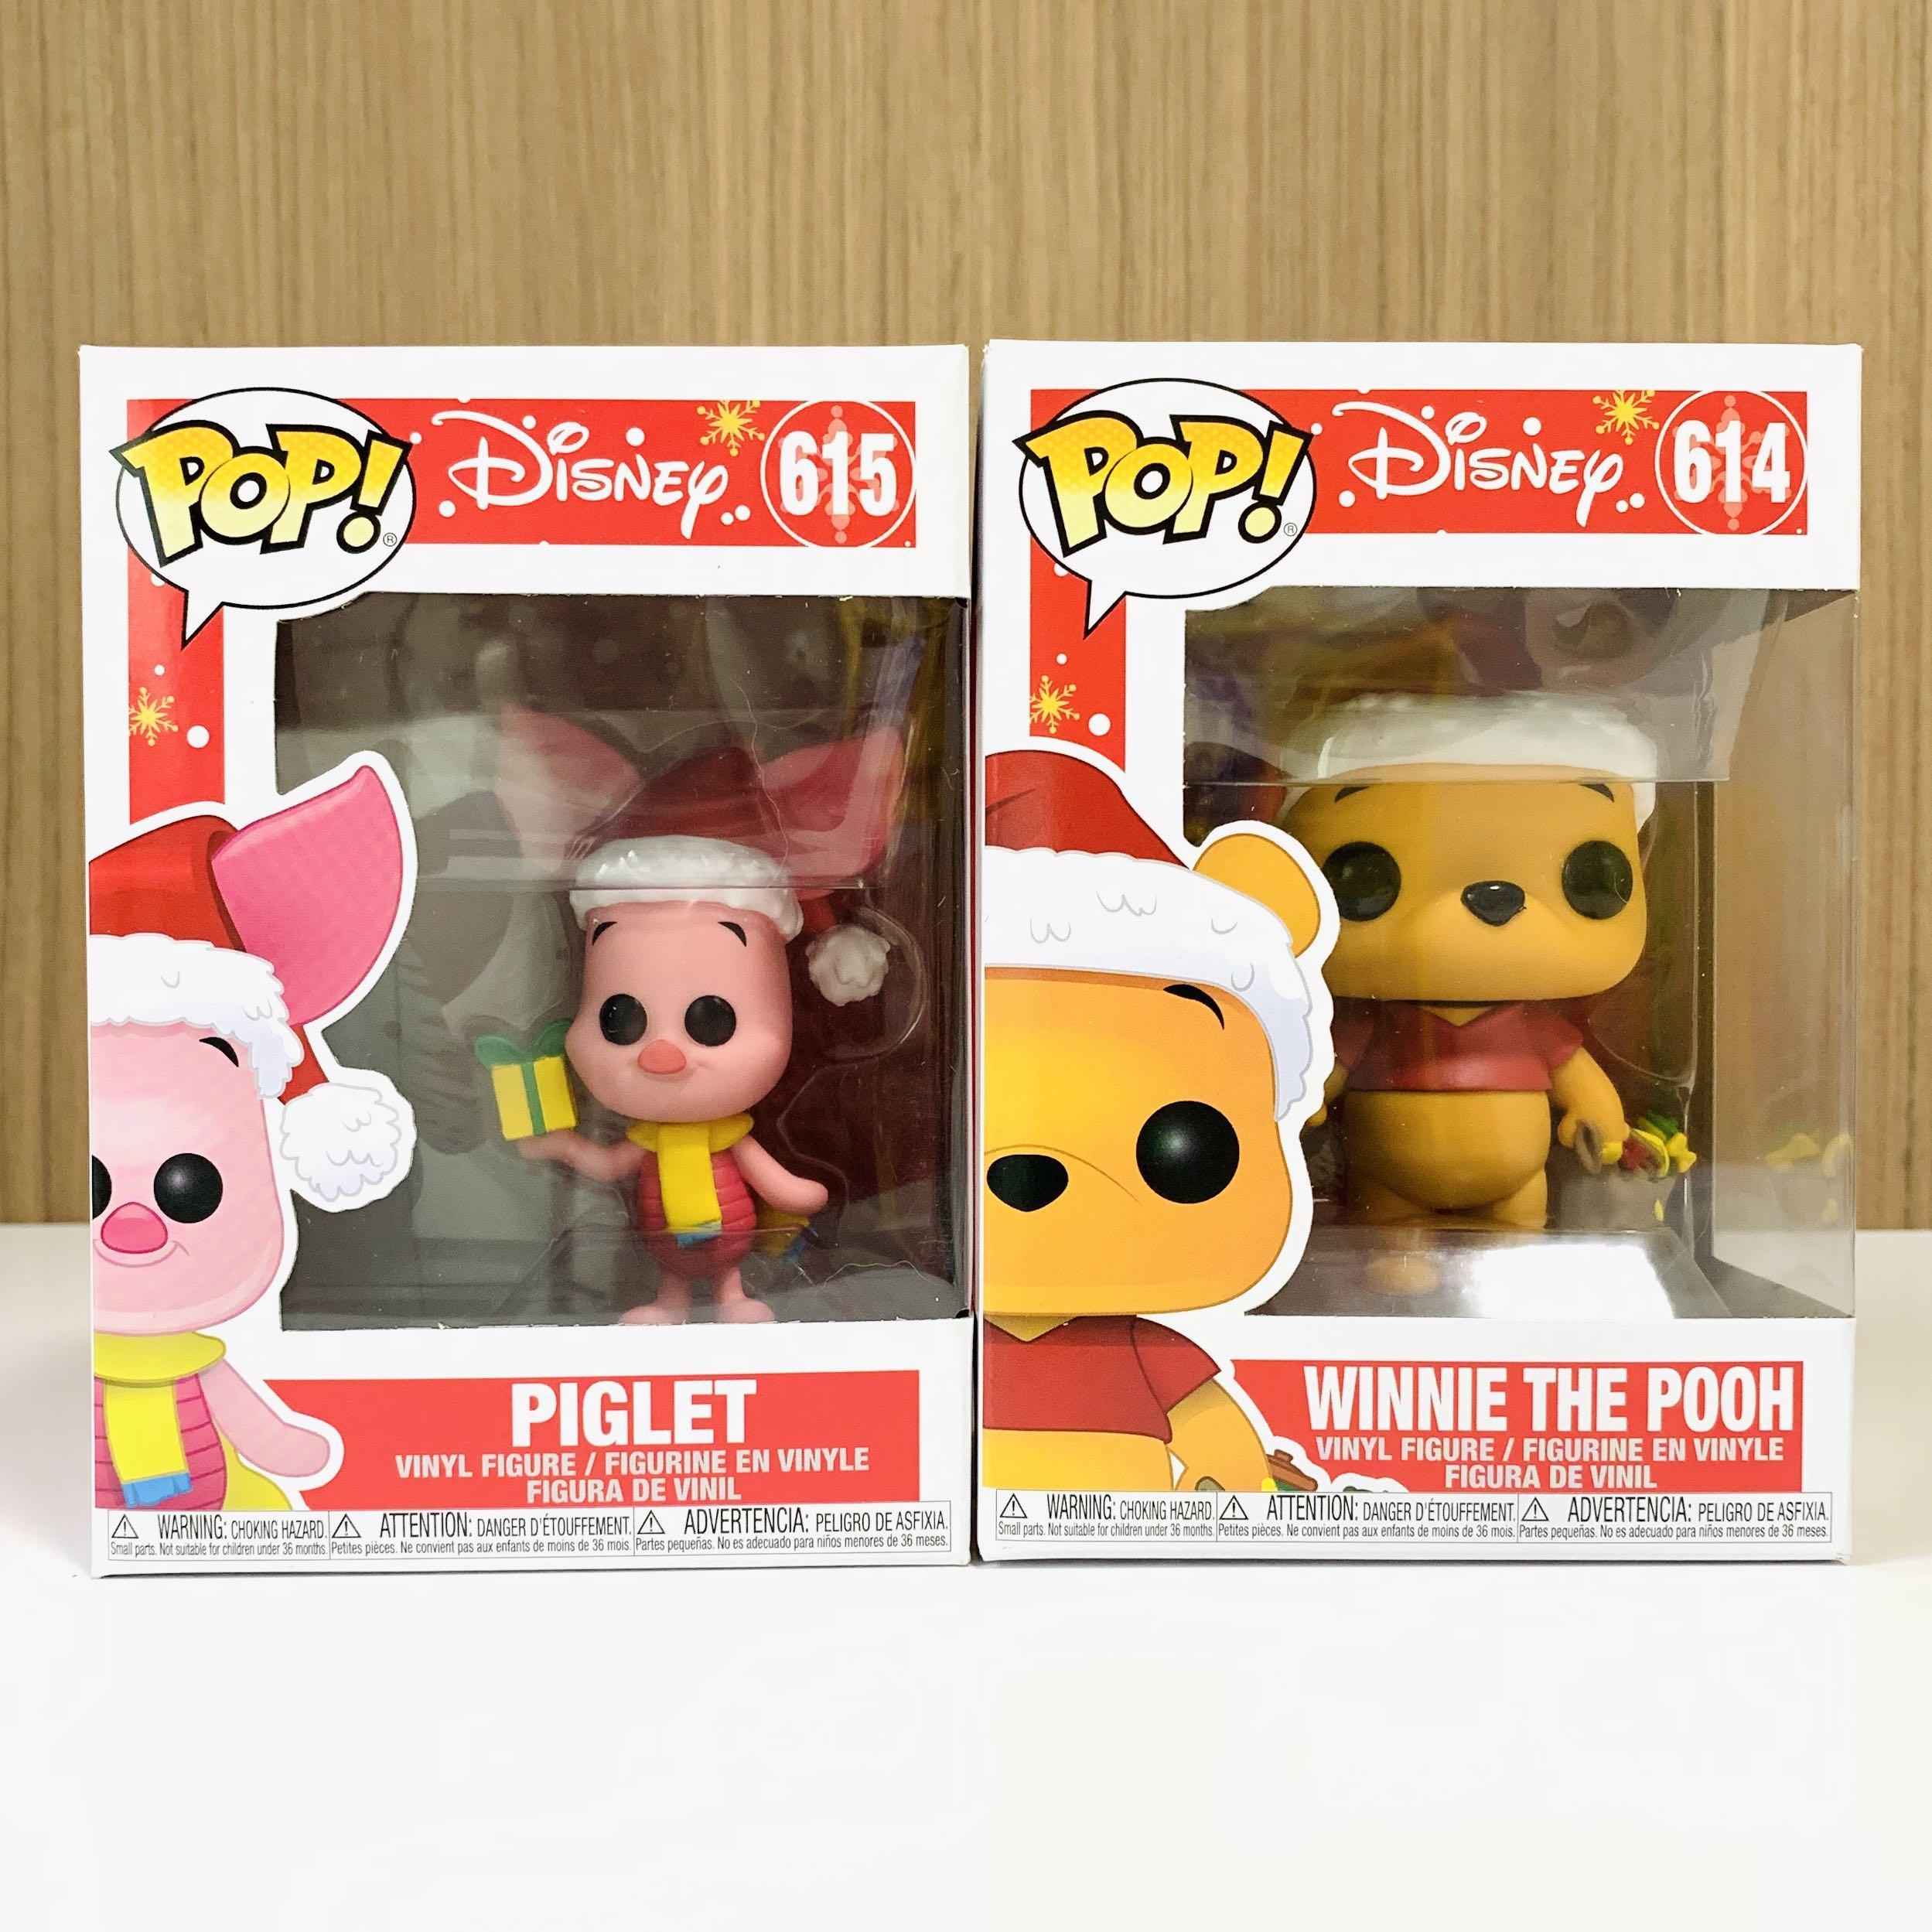 Disney Holiday Winnie The Pooh Vinyl Figur Funko Pop! Piglet 615